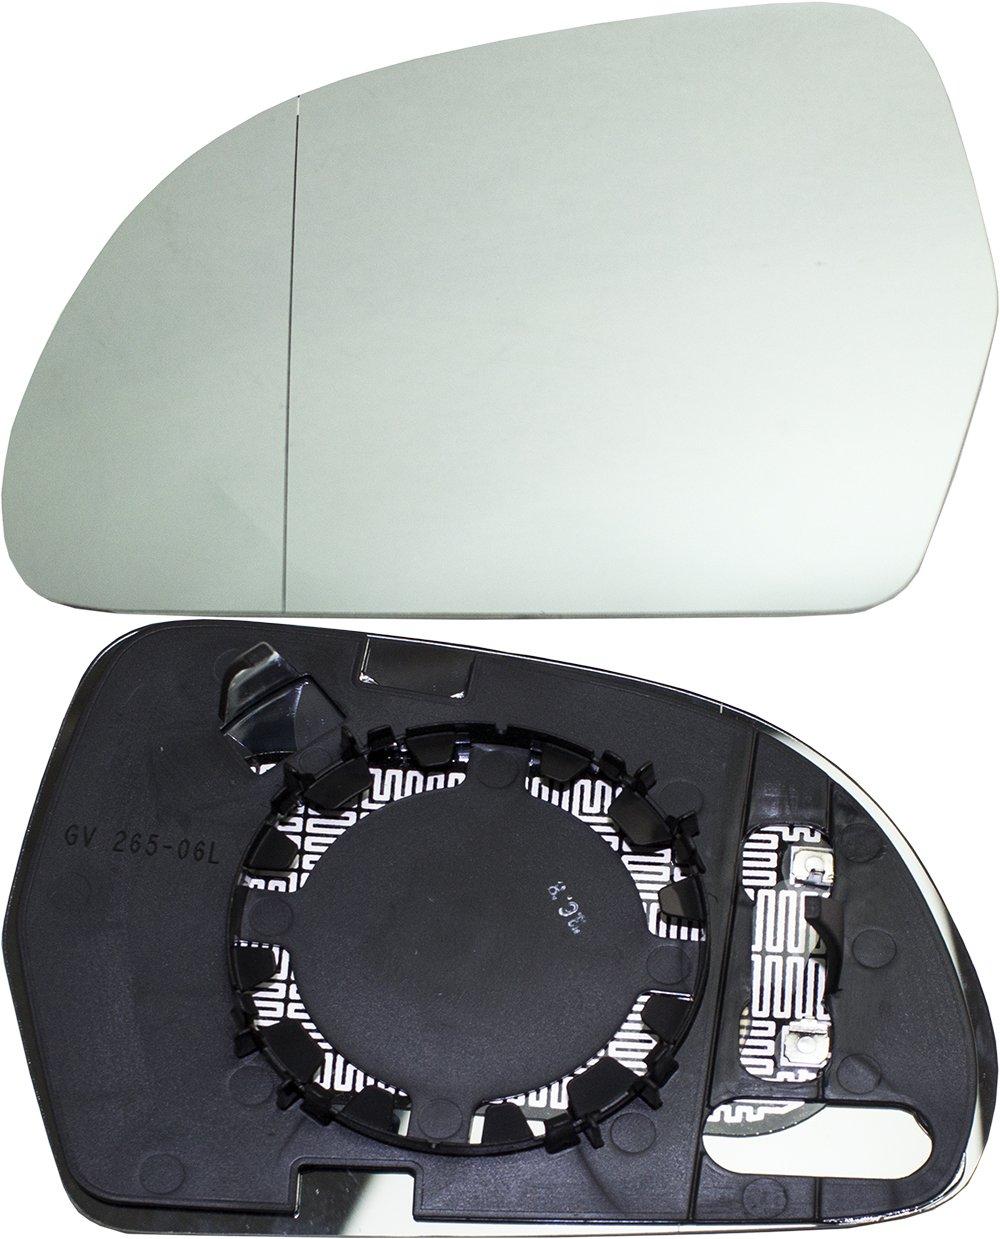 TarosTrade 57-0790-L-45712 Mirror Glass Heated Up To 2010